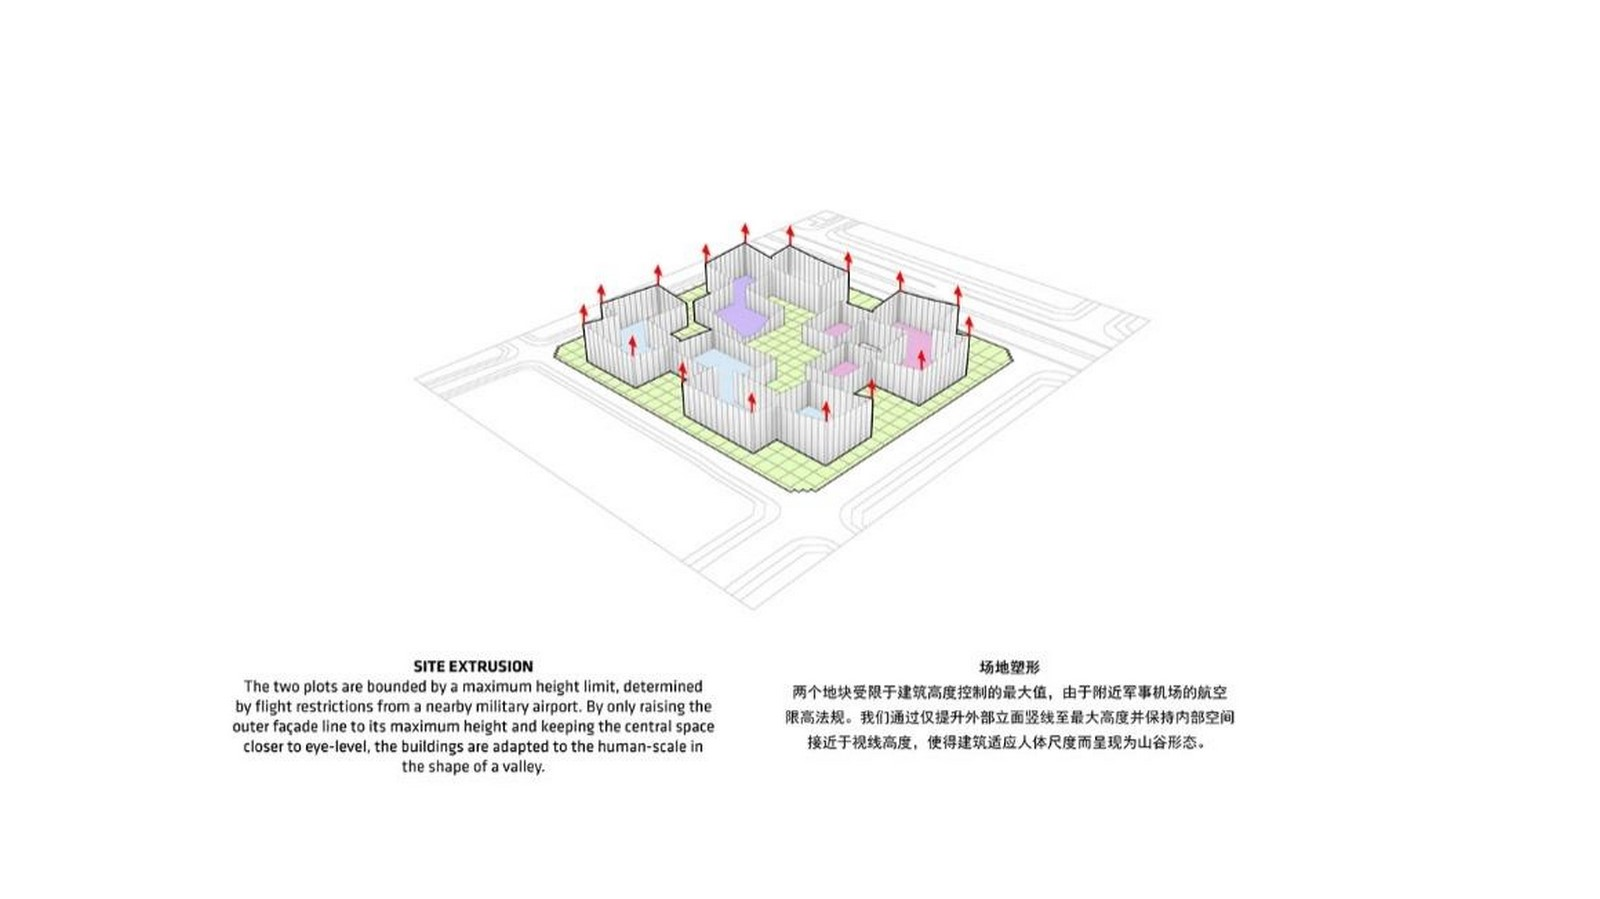 An Artificial Intelligence-Based 'Smart City' in China plans revealed Bjarke Ingels - Sheet7